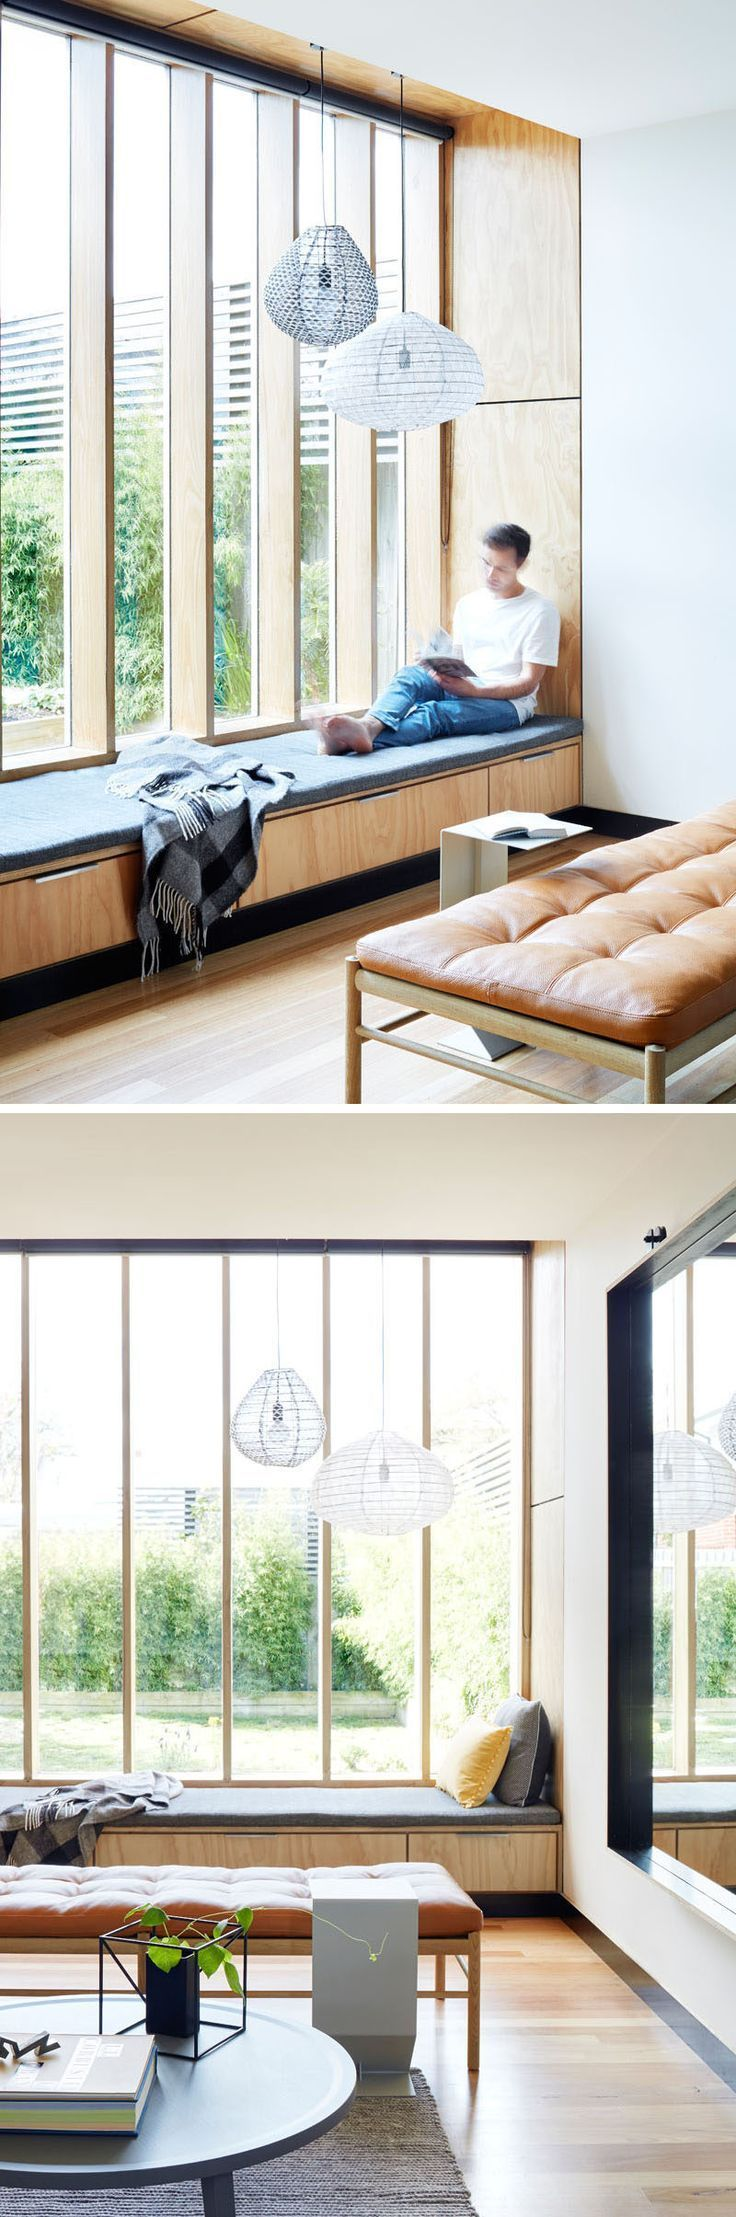 Bay window decor ideas   bay window ideas blending functionality with modern interior